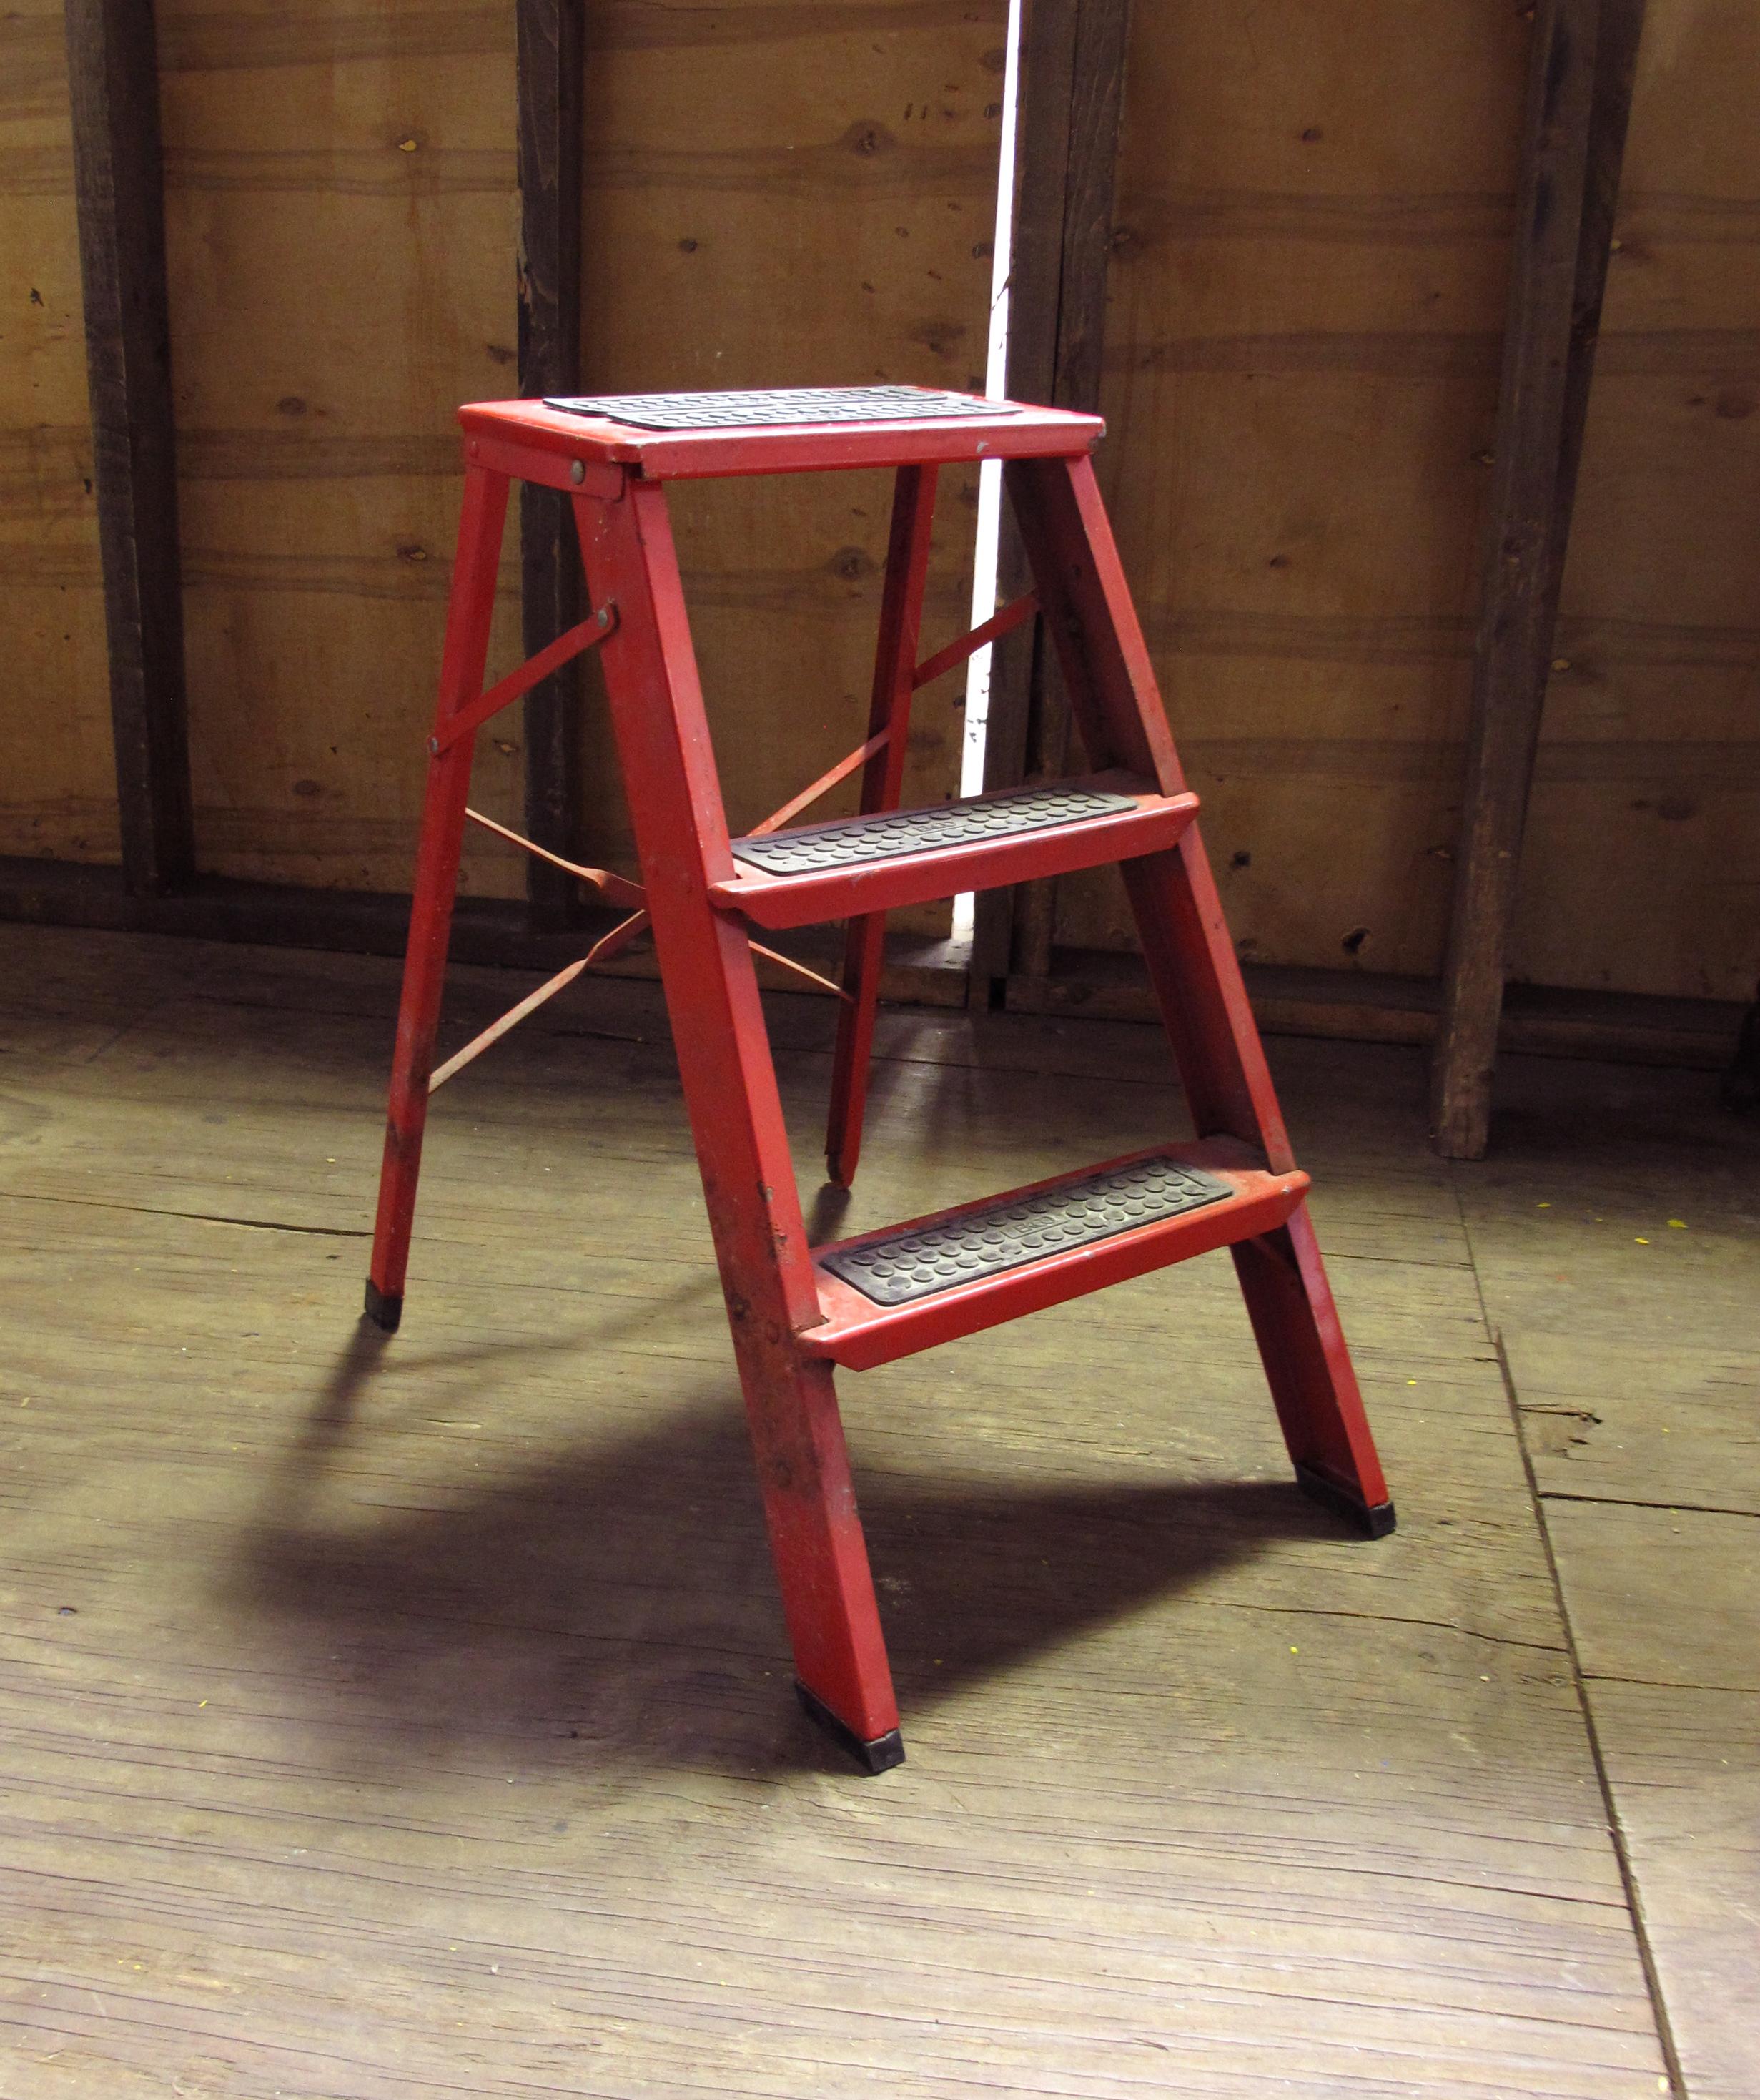 Short Red Metal 3-step Ladder $25